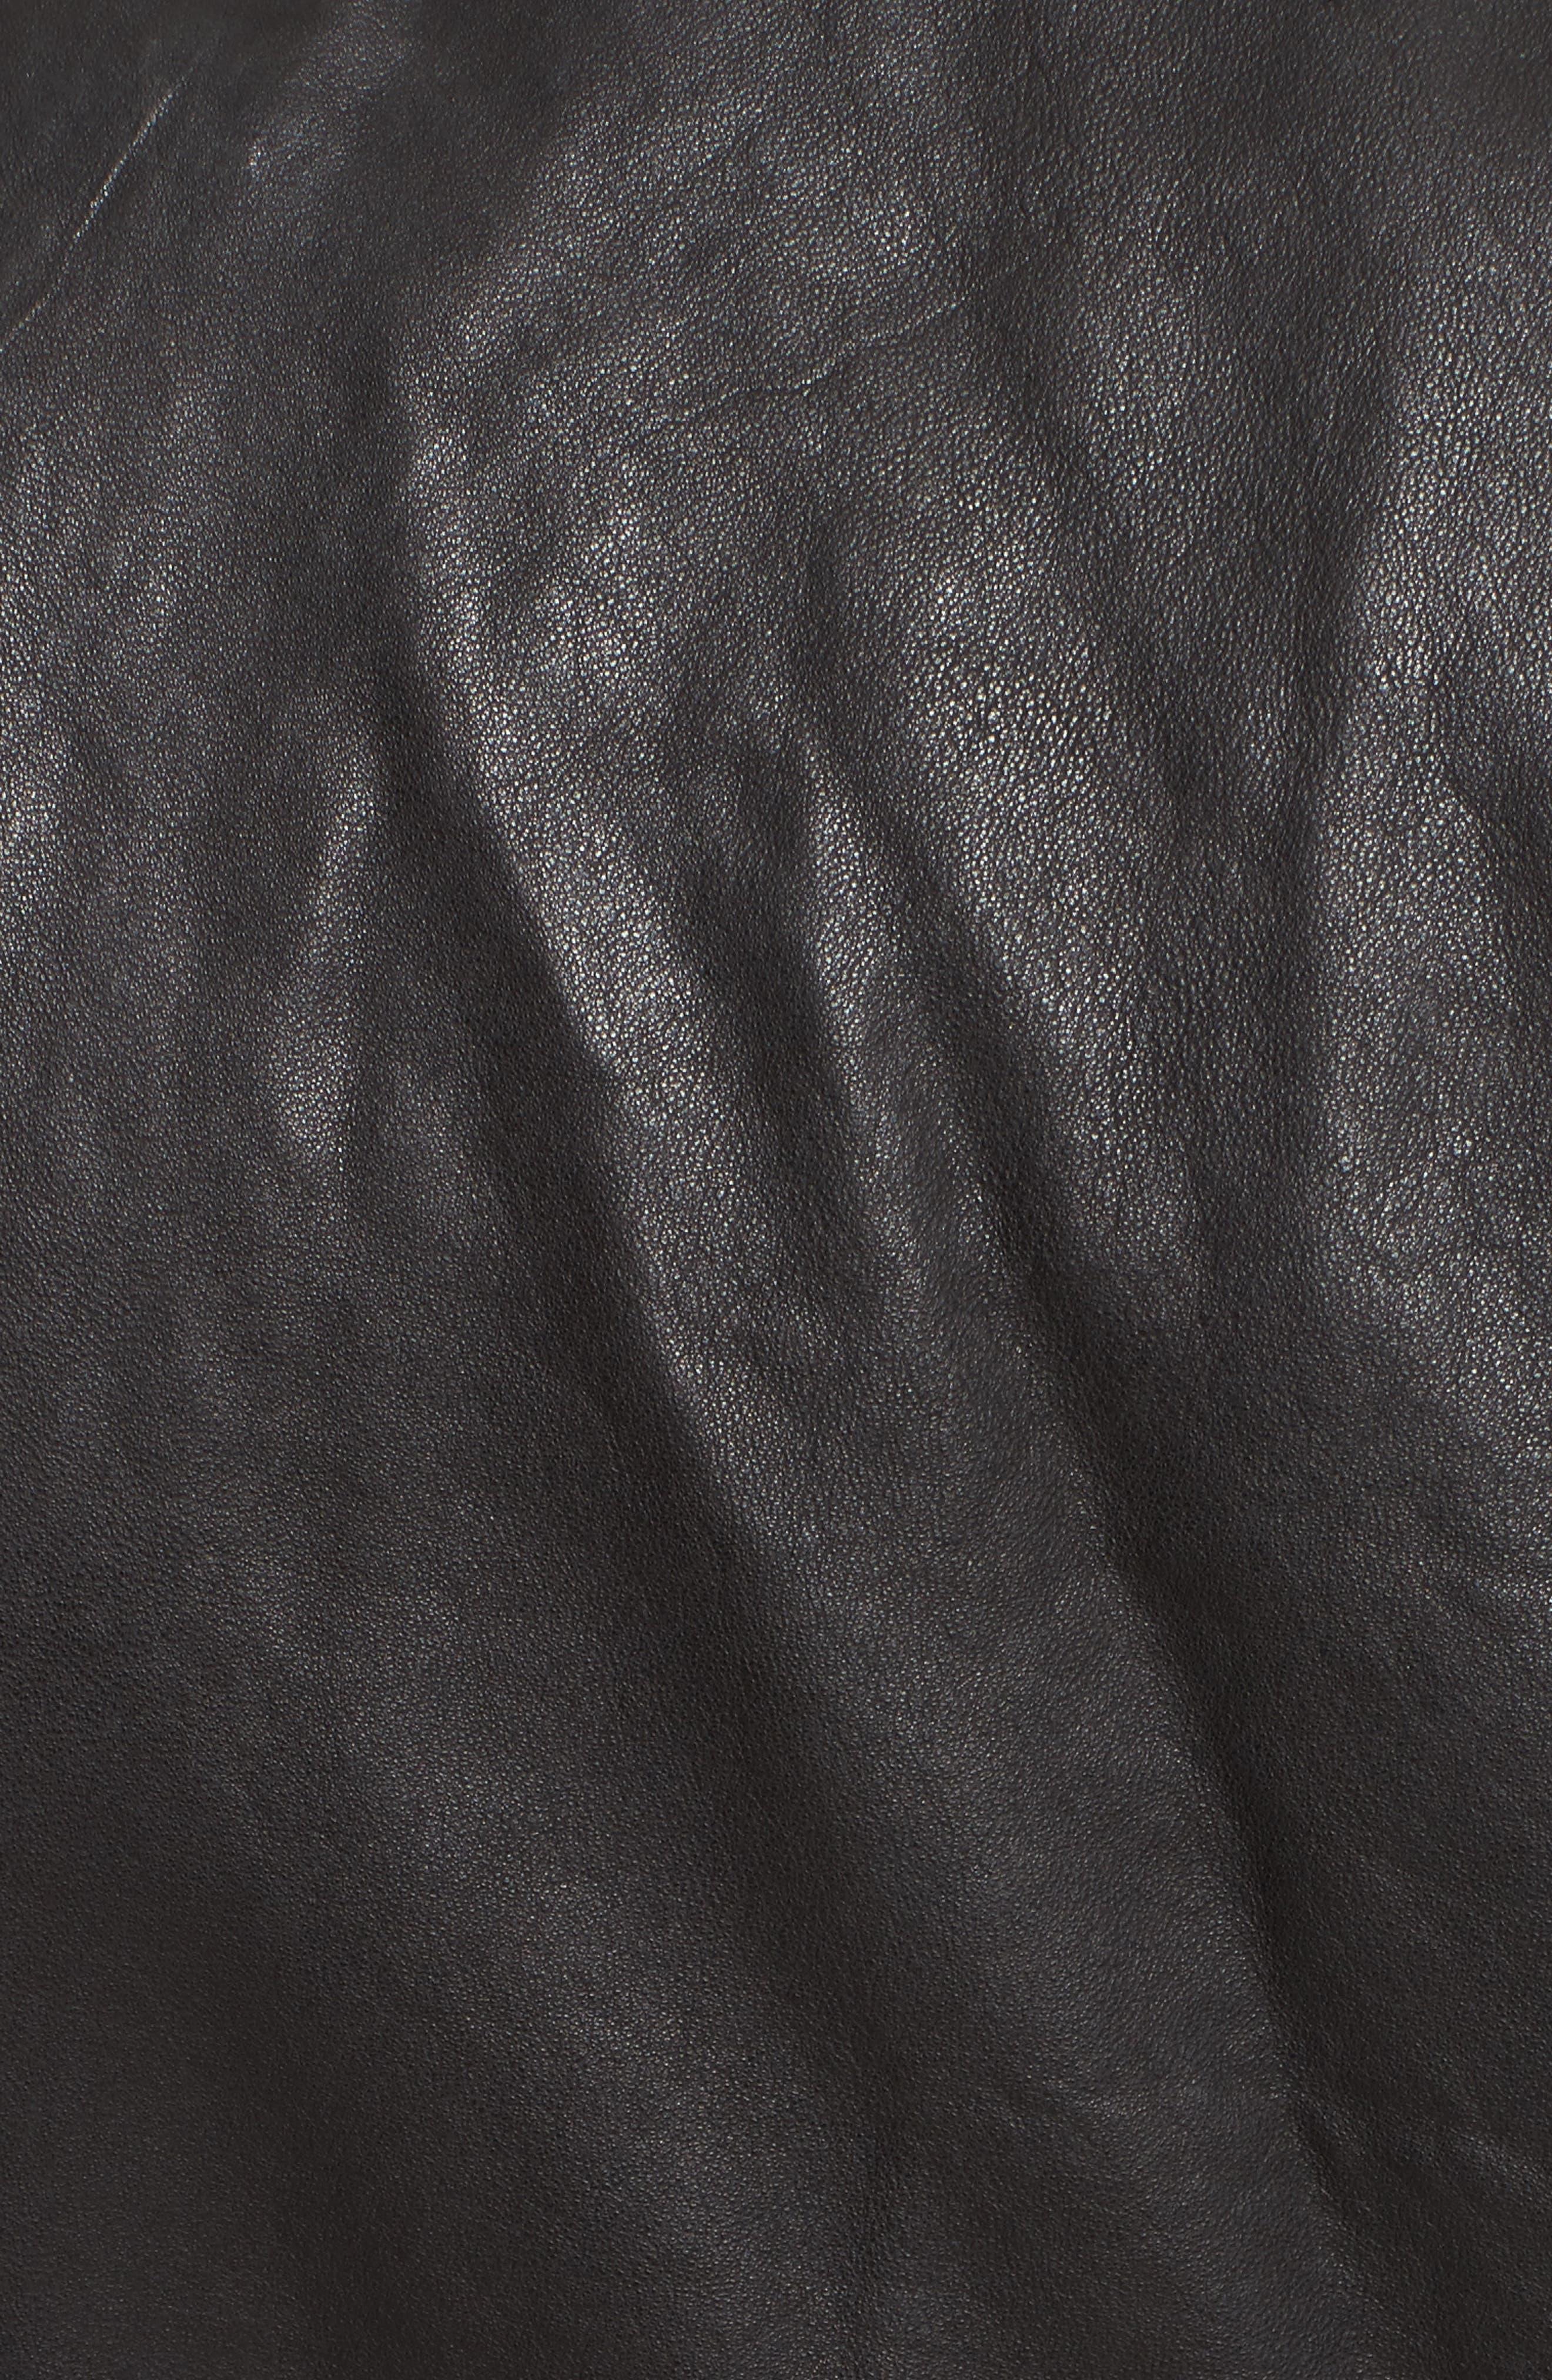 Lyon Leather Jacket,                             Alternate thumbnail 5, color,                             Black